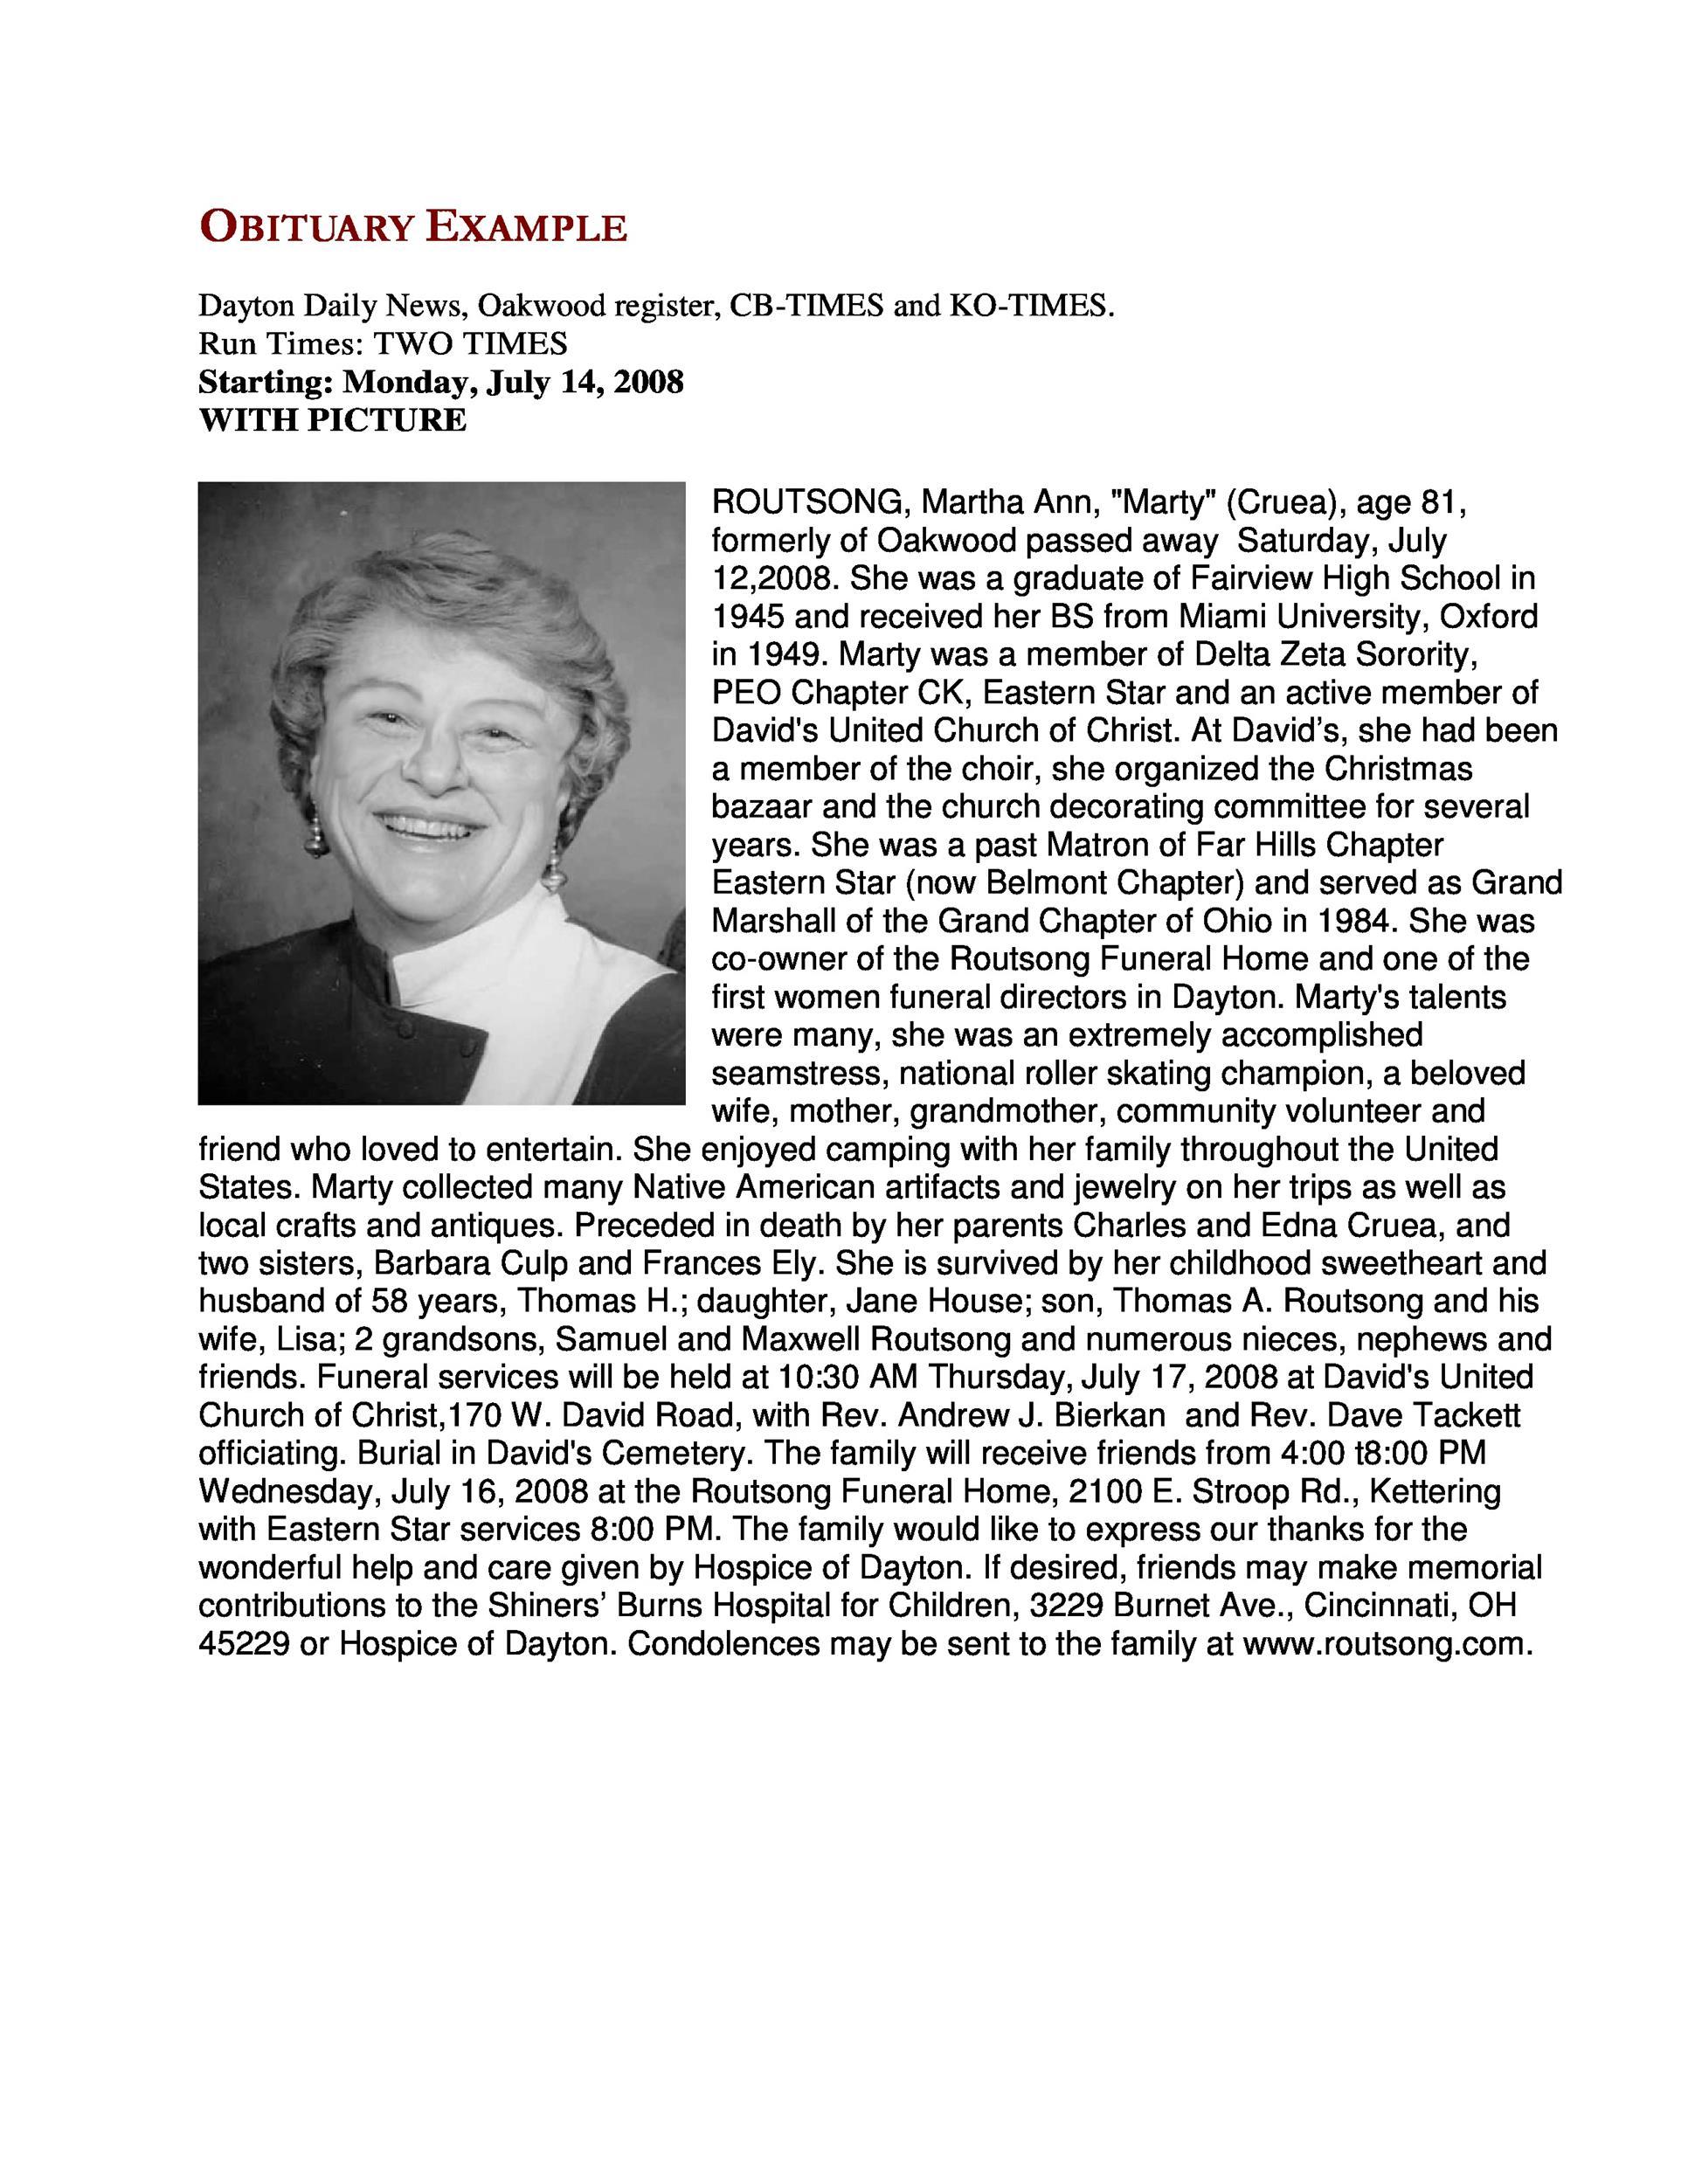 Free Obituary Example